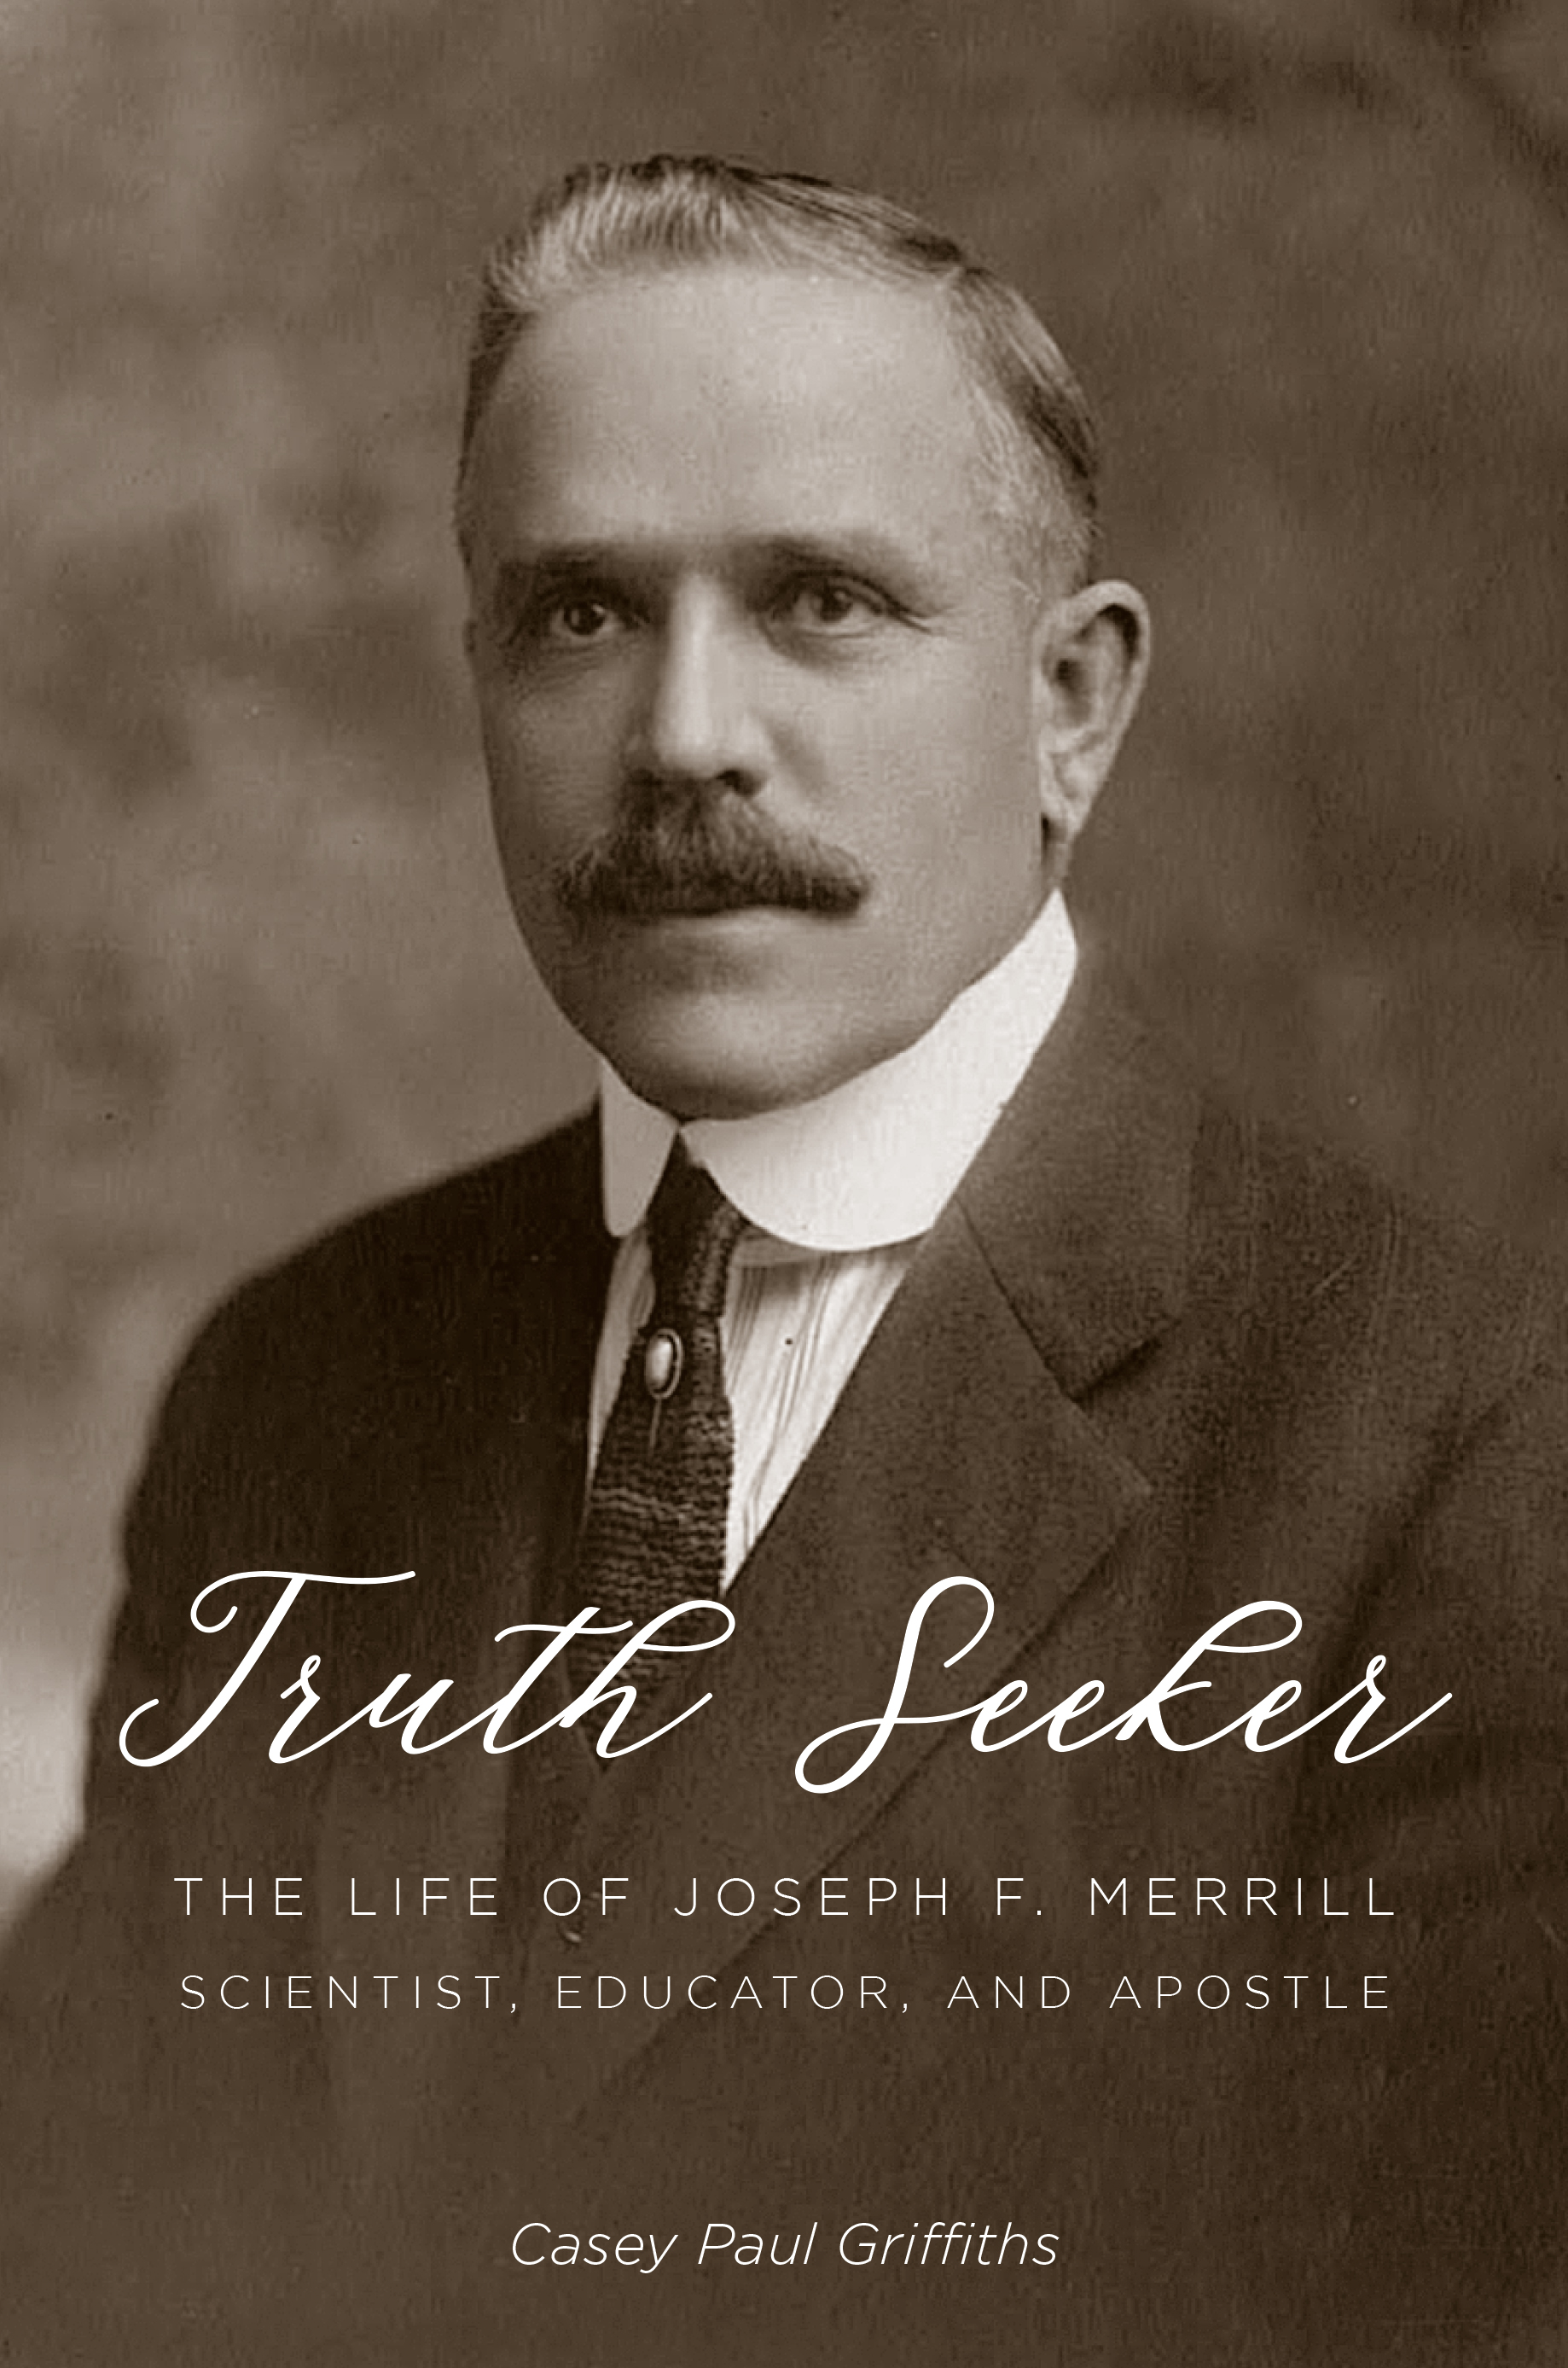 A portrait shows Joseph F. Merrill, scientist, educator and Latter-day Saint apostle.